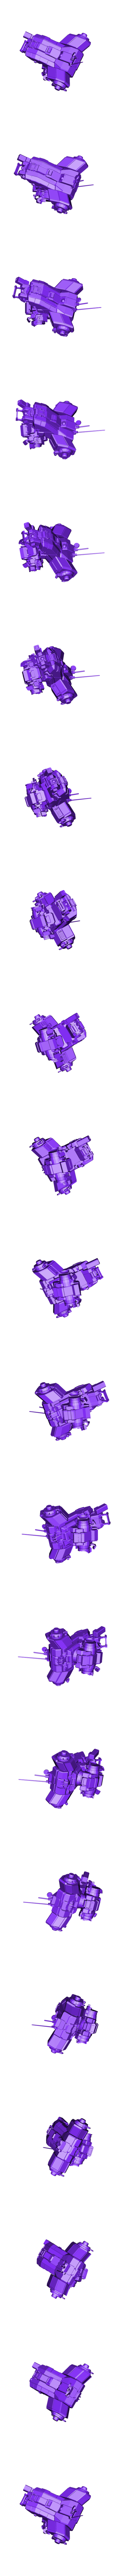 Locust_Statue_Mech_Torso.stl Download free STL file MechWarrior Online Locust Statue • 3D printer object, Solid_Alexei